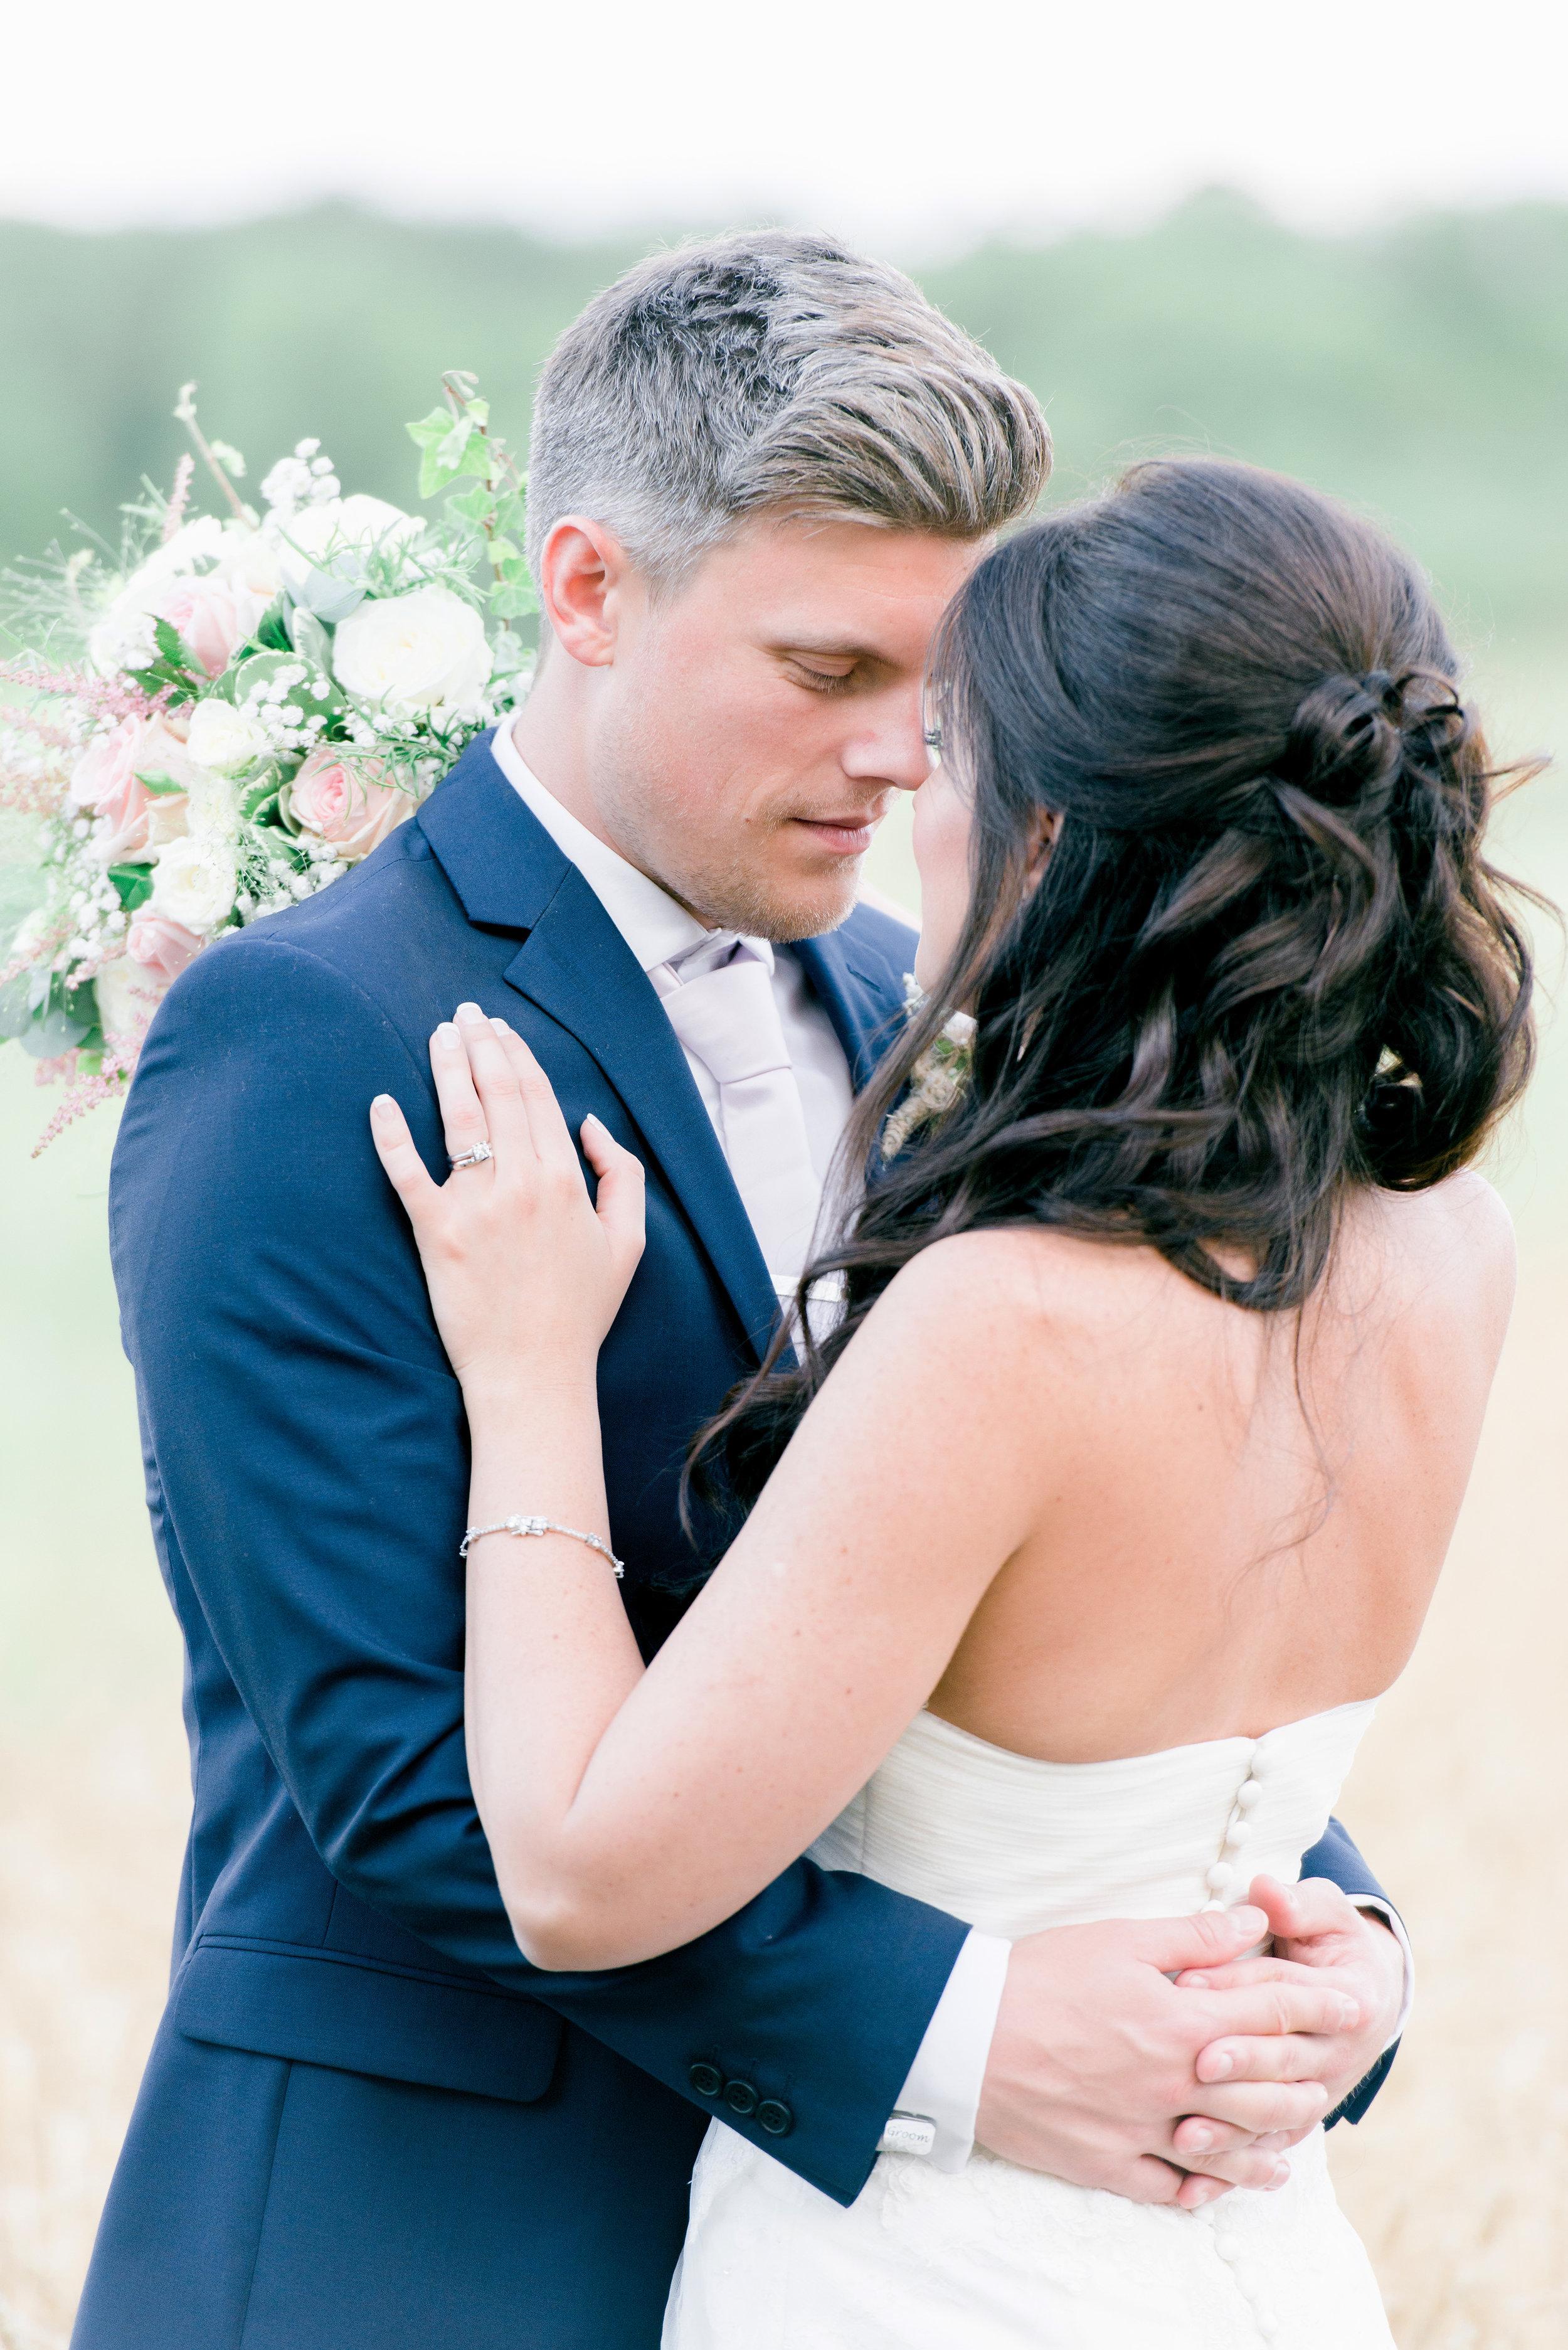 Kim & Billy married at Wilobe Farm Barn in Pidley